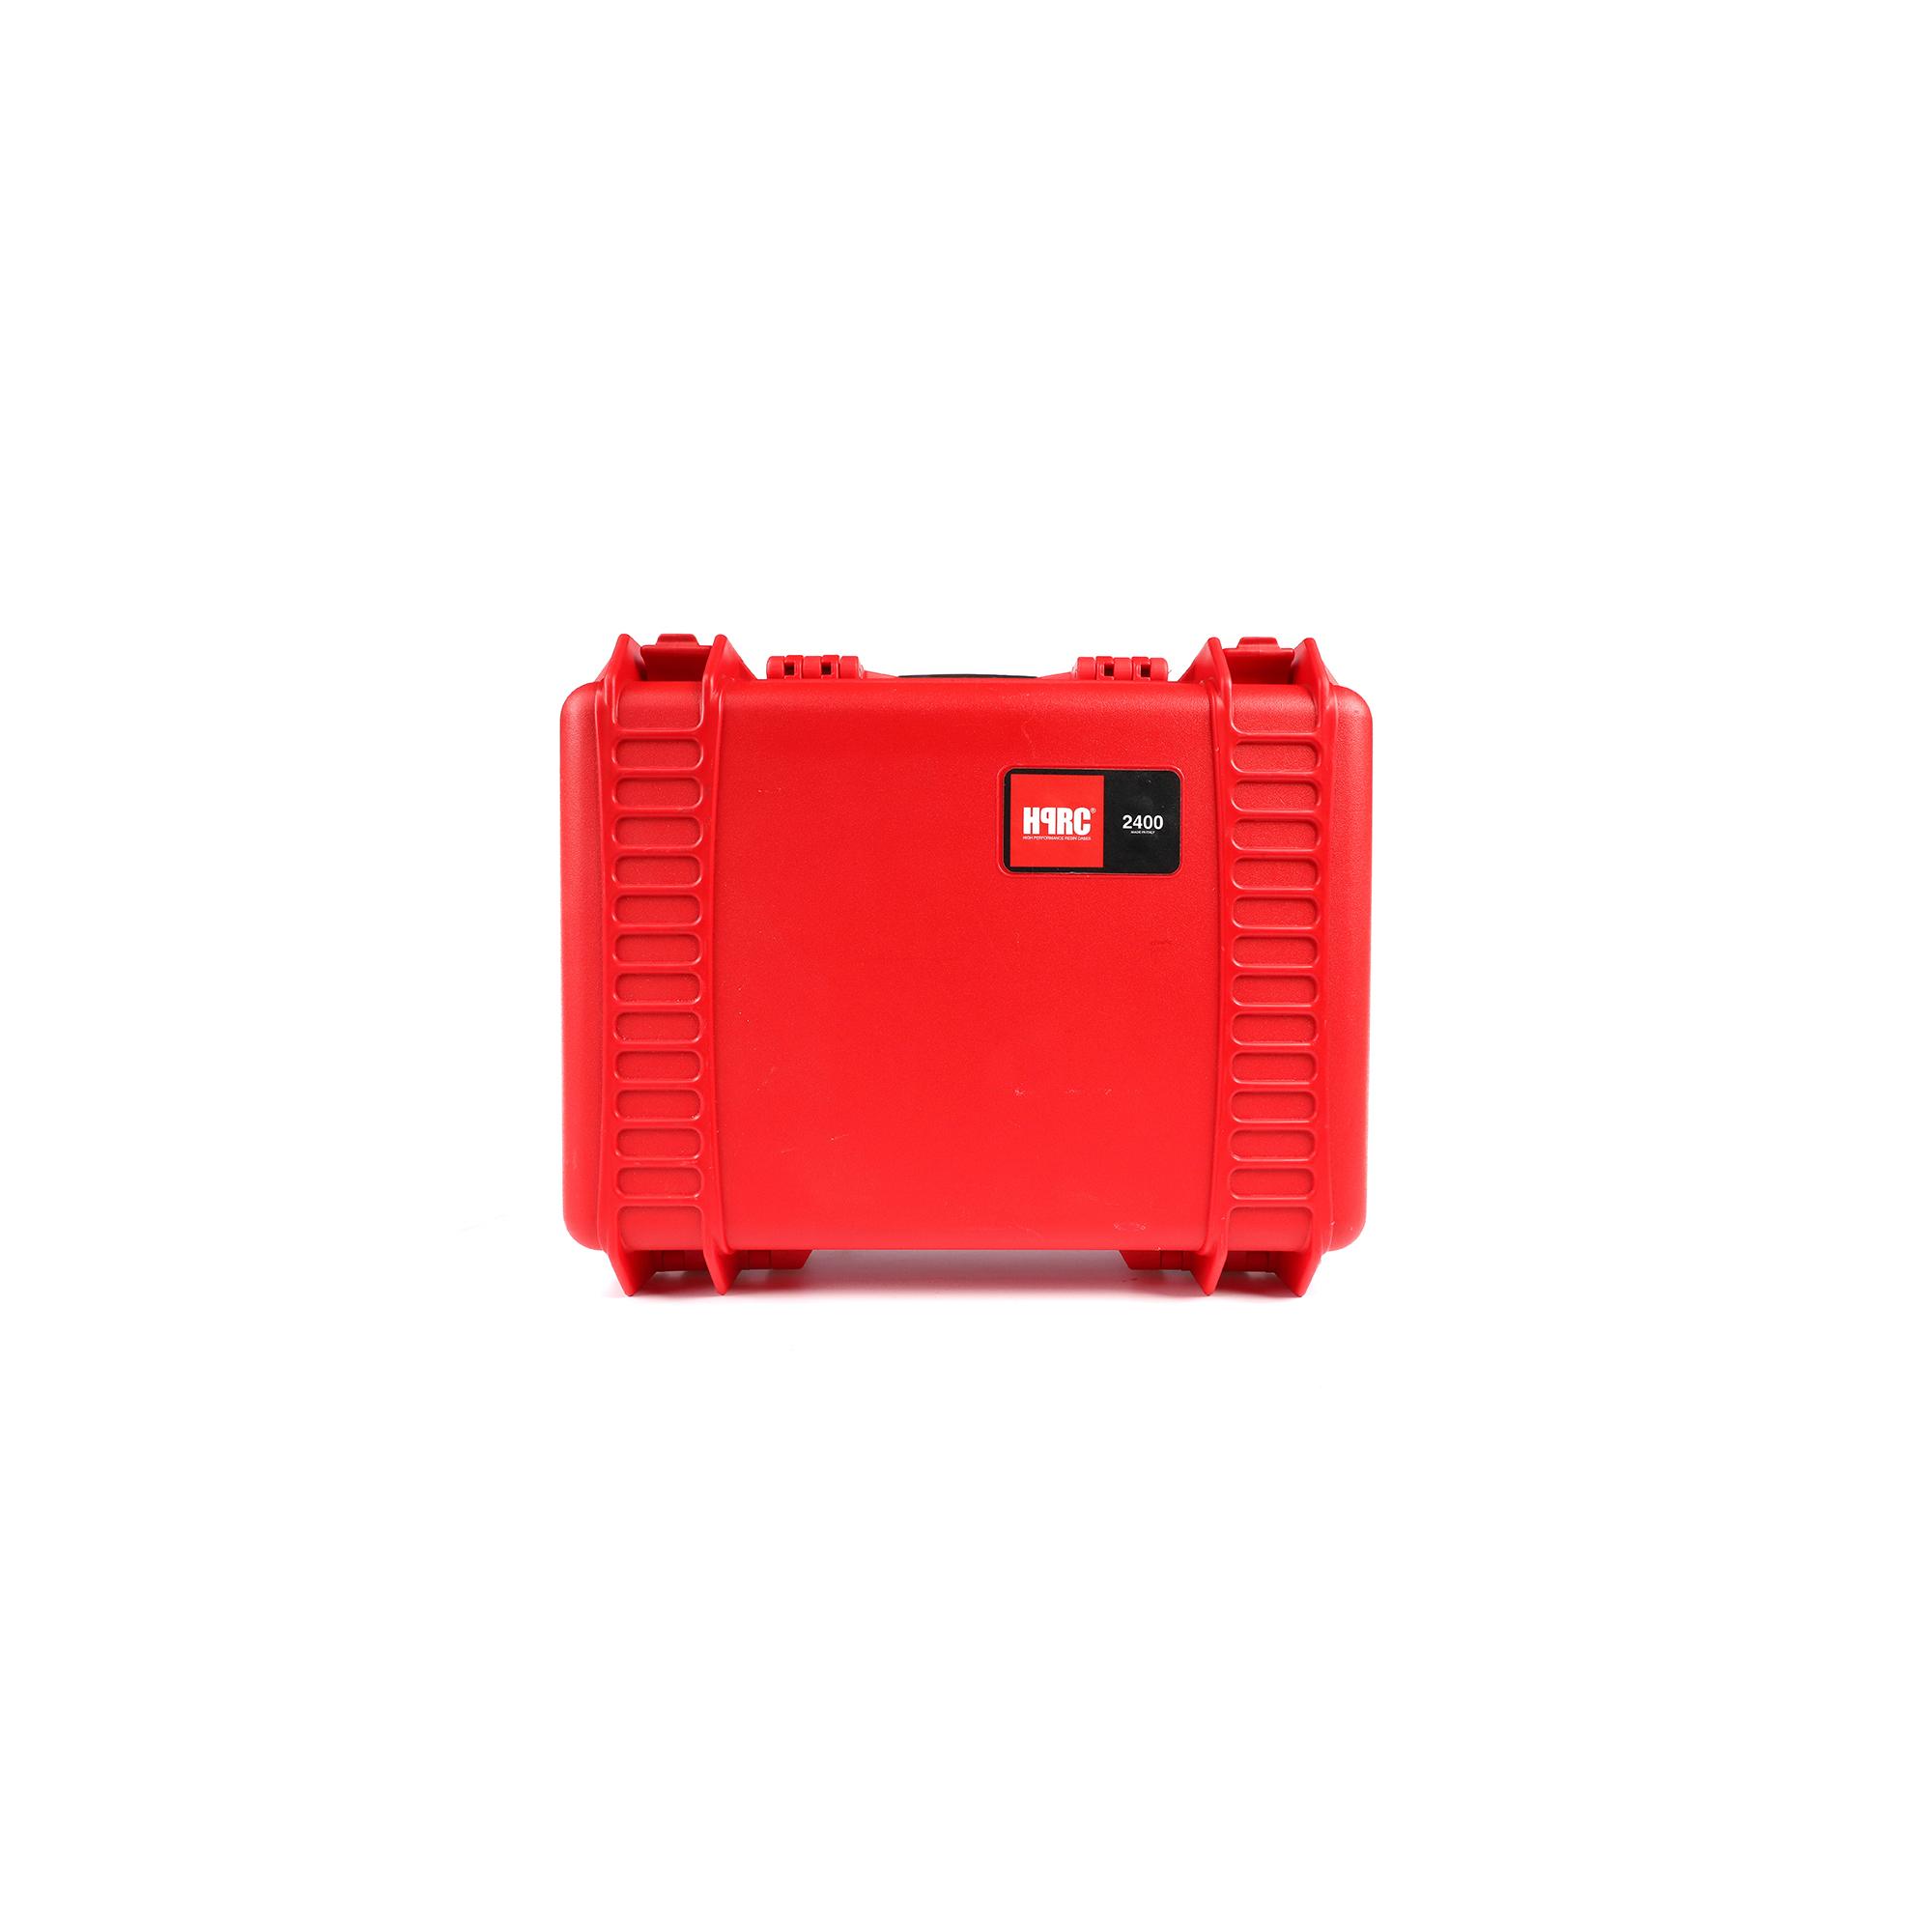 RED HARD CASE - 1 - 1.jpg